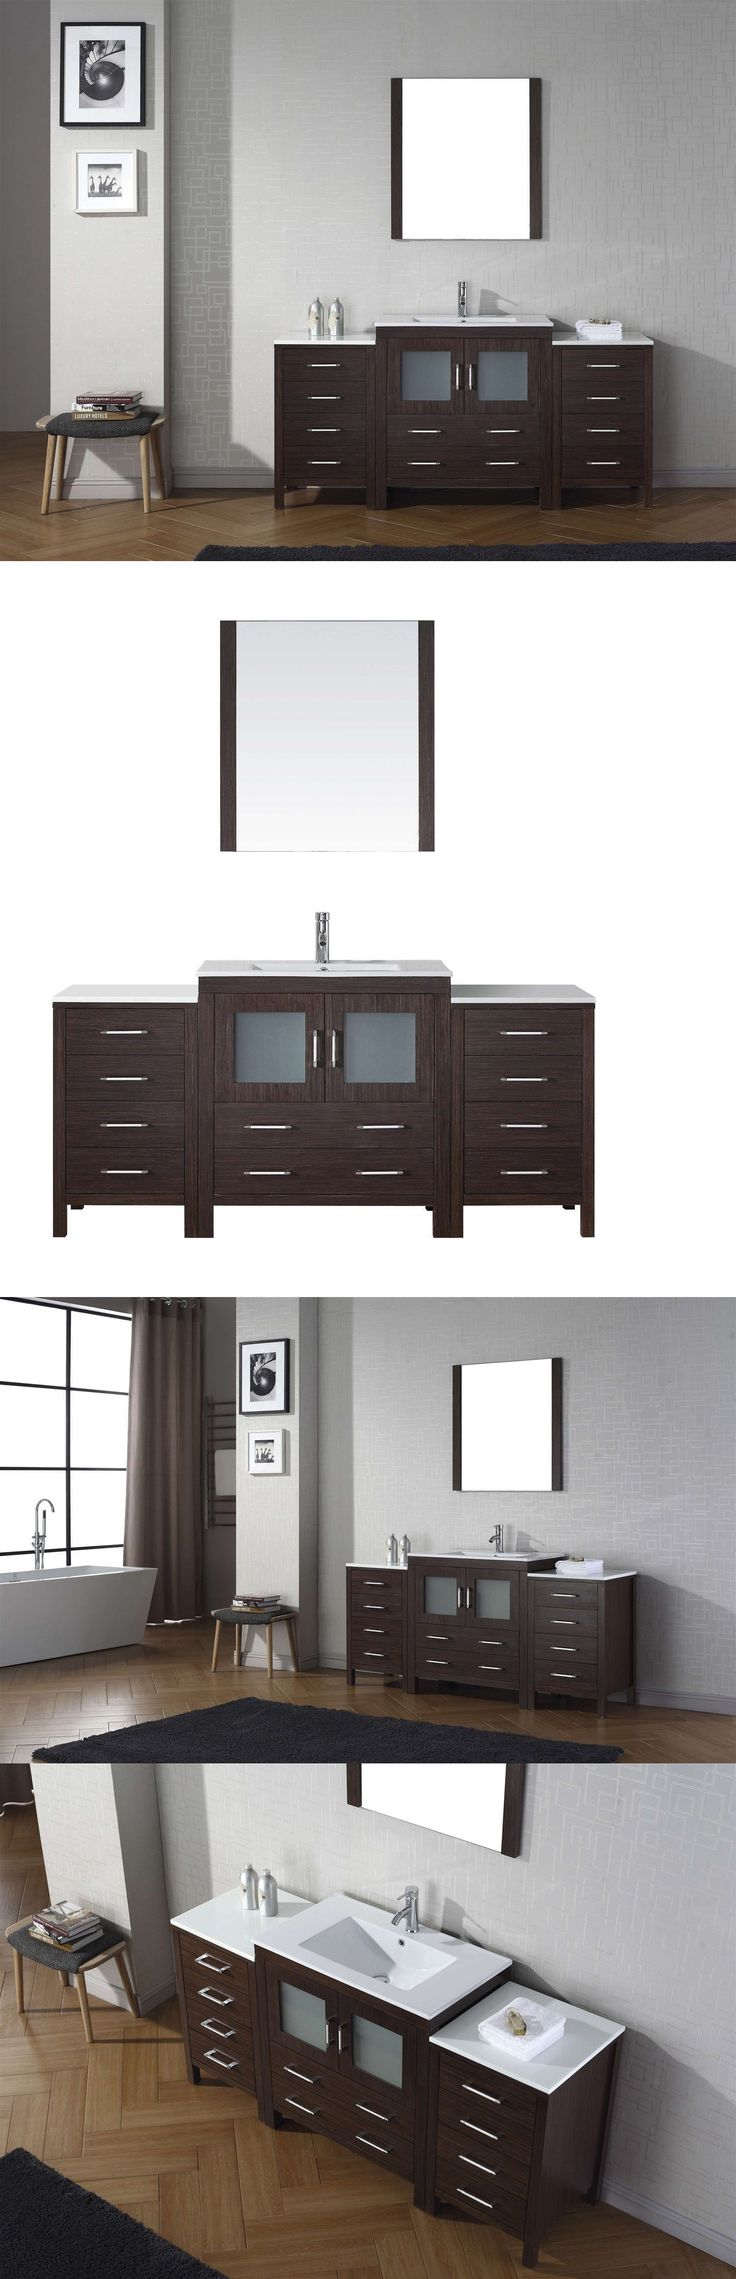 Vanities 115625: Dior 68 Single Sink Basin Bathroom Vanity Espresso Cabinet With Ceramic Top -> BUY IT NOW ONLY: $1159.71 on eBay!